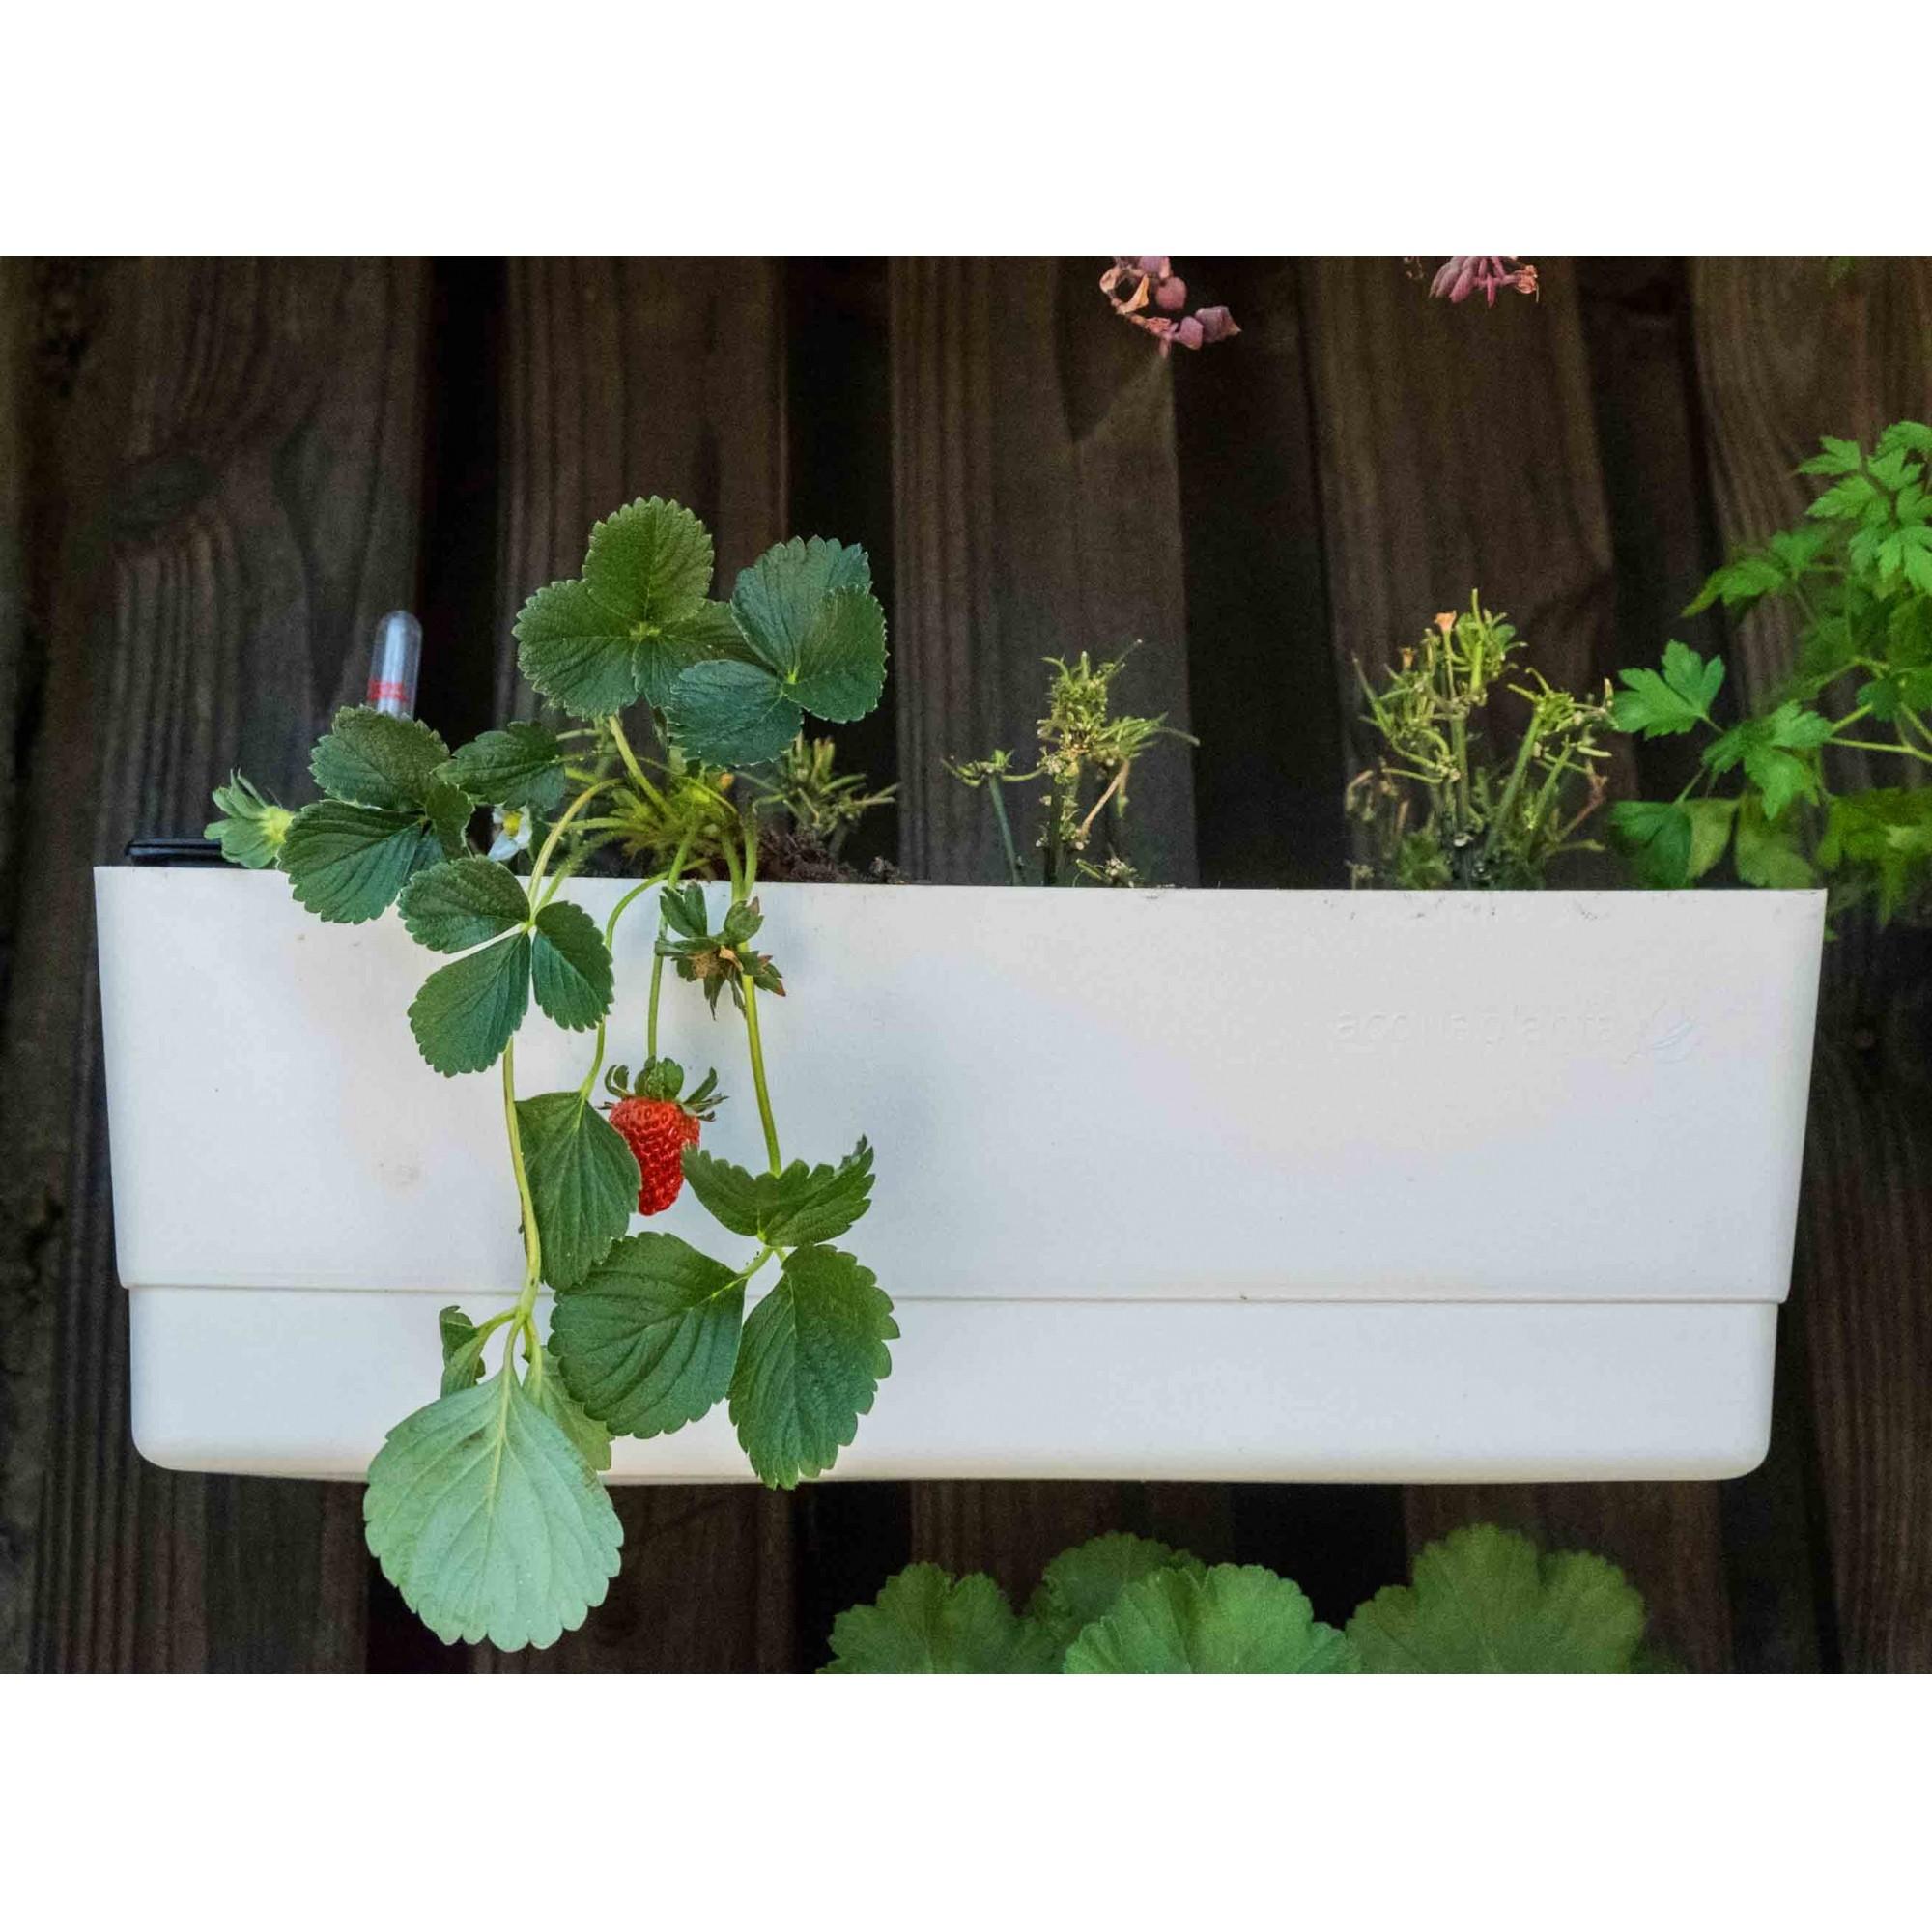 Vaso de Parede Horta Autoirrigável Acqua Planta Branco 18cm x 44cm